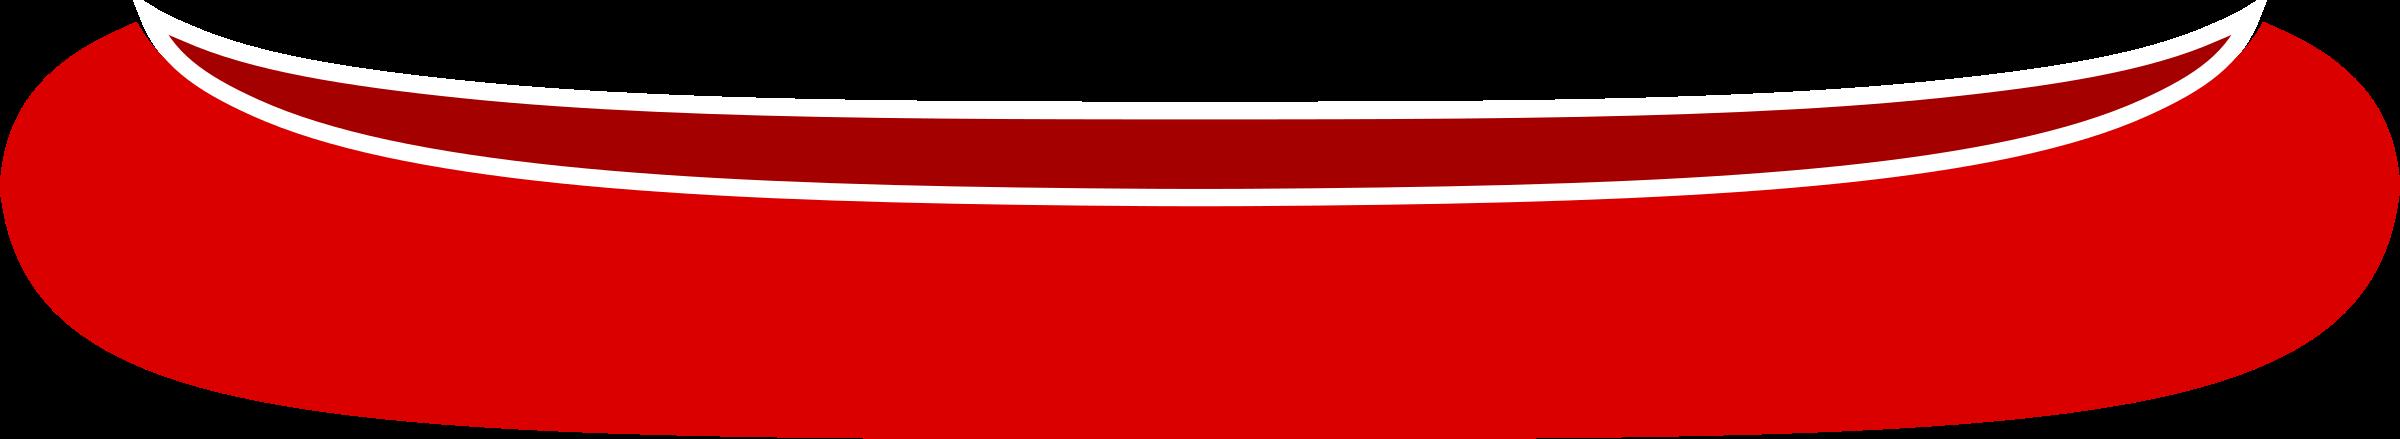 Red Canoe Clipart.